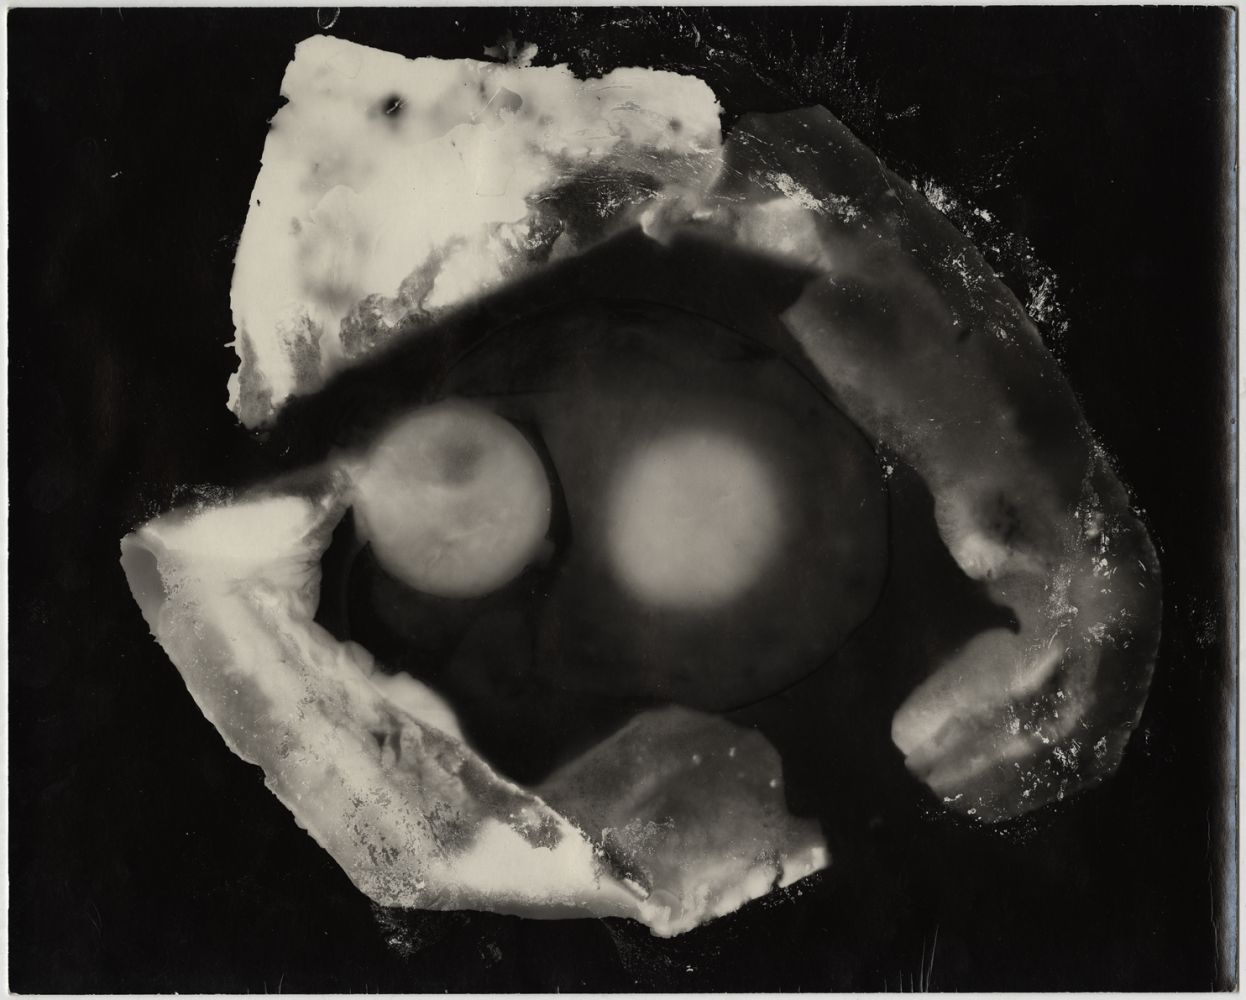 Documentary Photogram #13 (Breakfast/Bacon, Egg, Toast), 1971 Silver gelatin print 8 x 10 inches